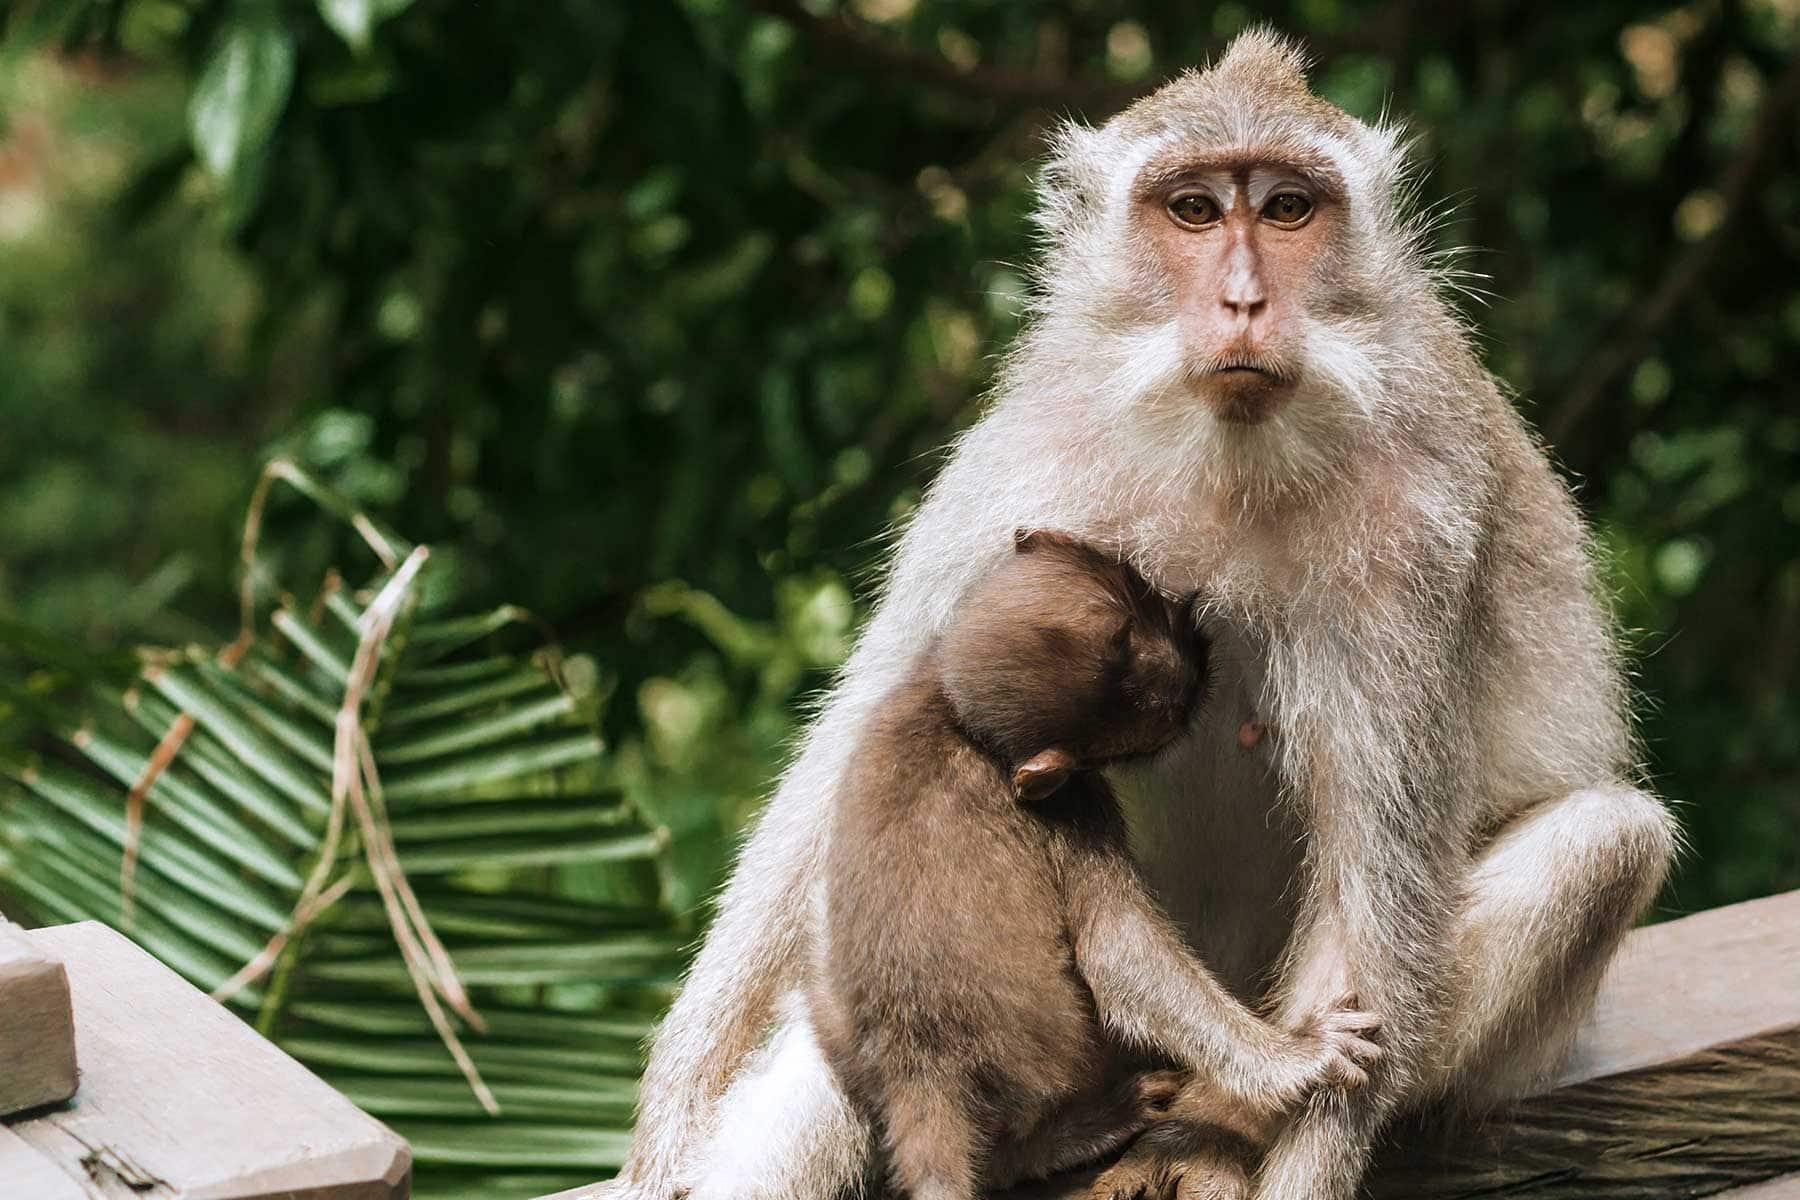 Resor-till-Bali-med-Nygren-&-Lind-Resebyrå---apa-med-unge